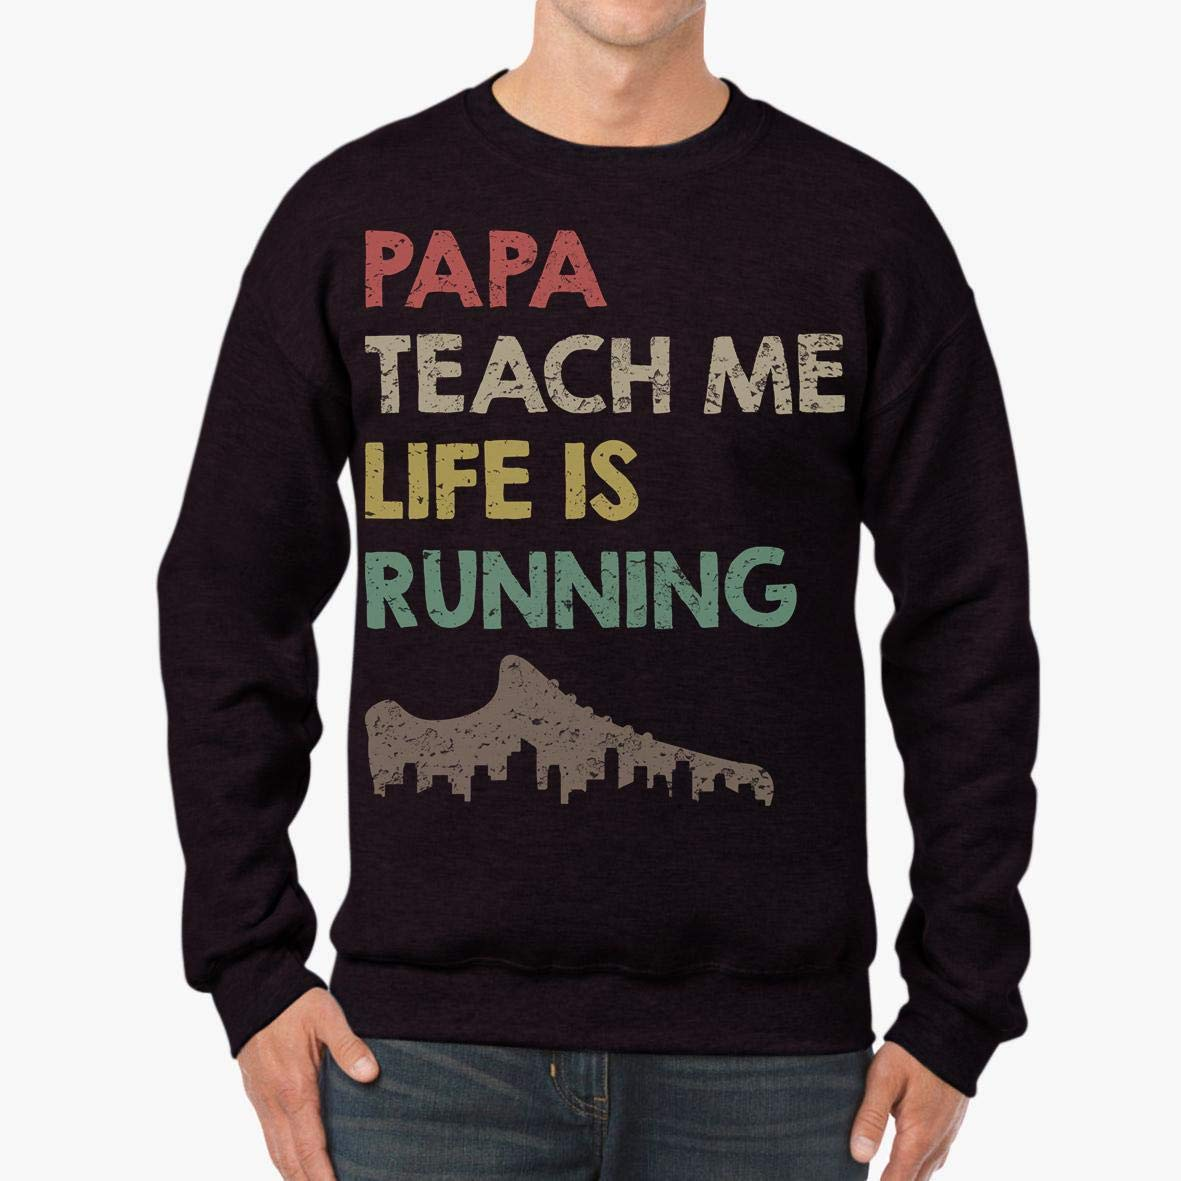 tee Papa Teach me Life is Running Awesome Unisex Sweatshirt